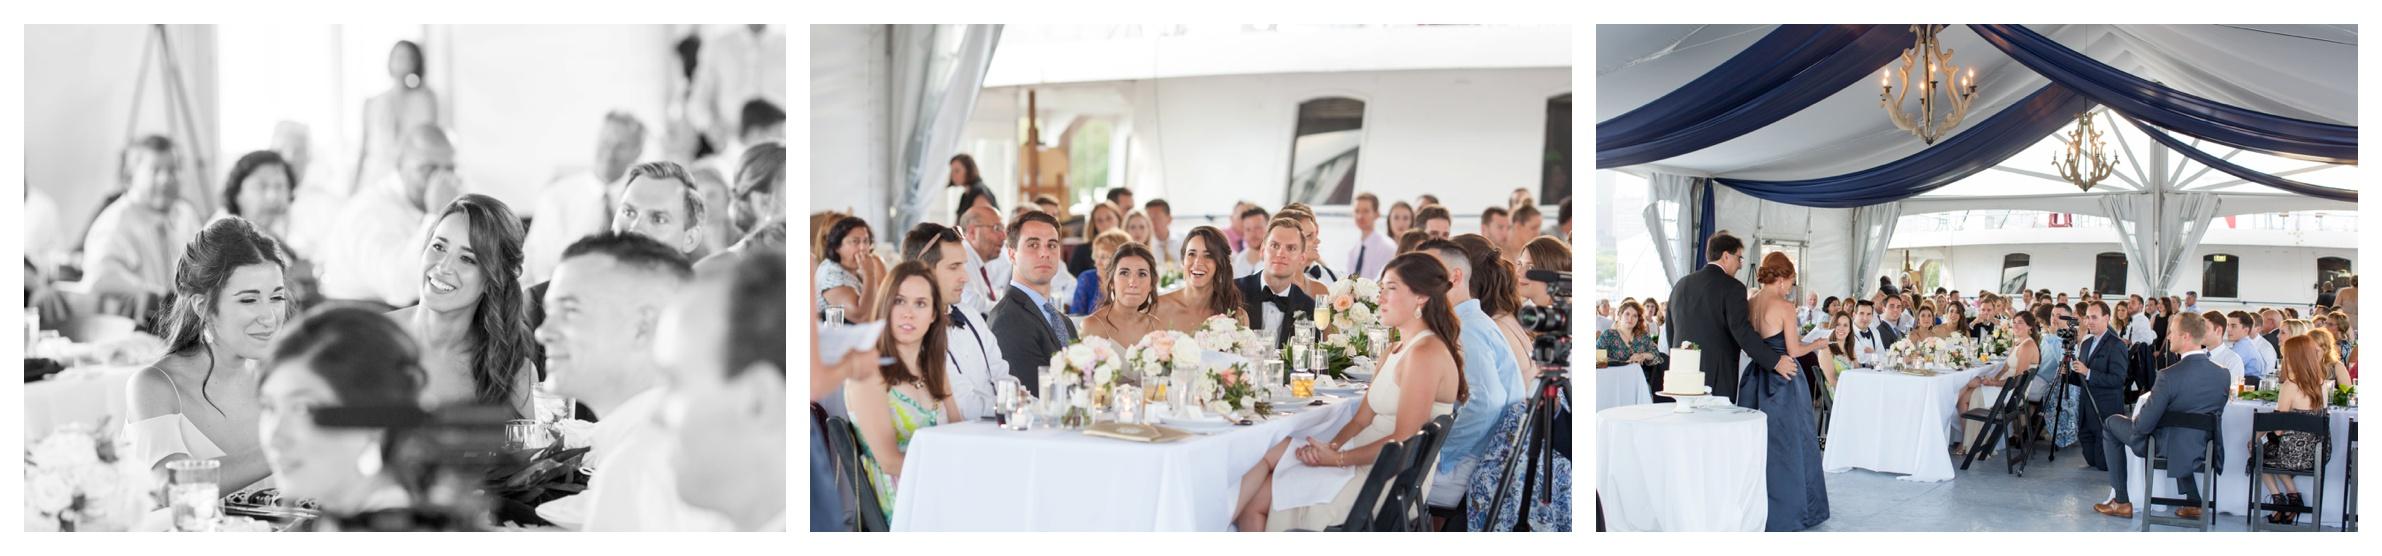 columbia-yacht-club-chicago-wedding_0044.jpg